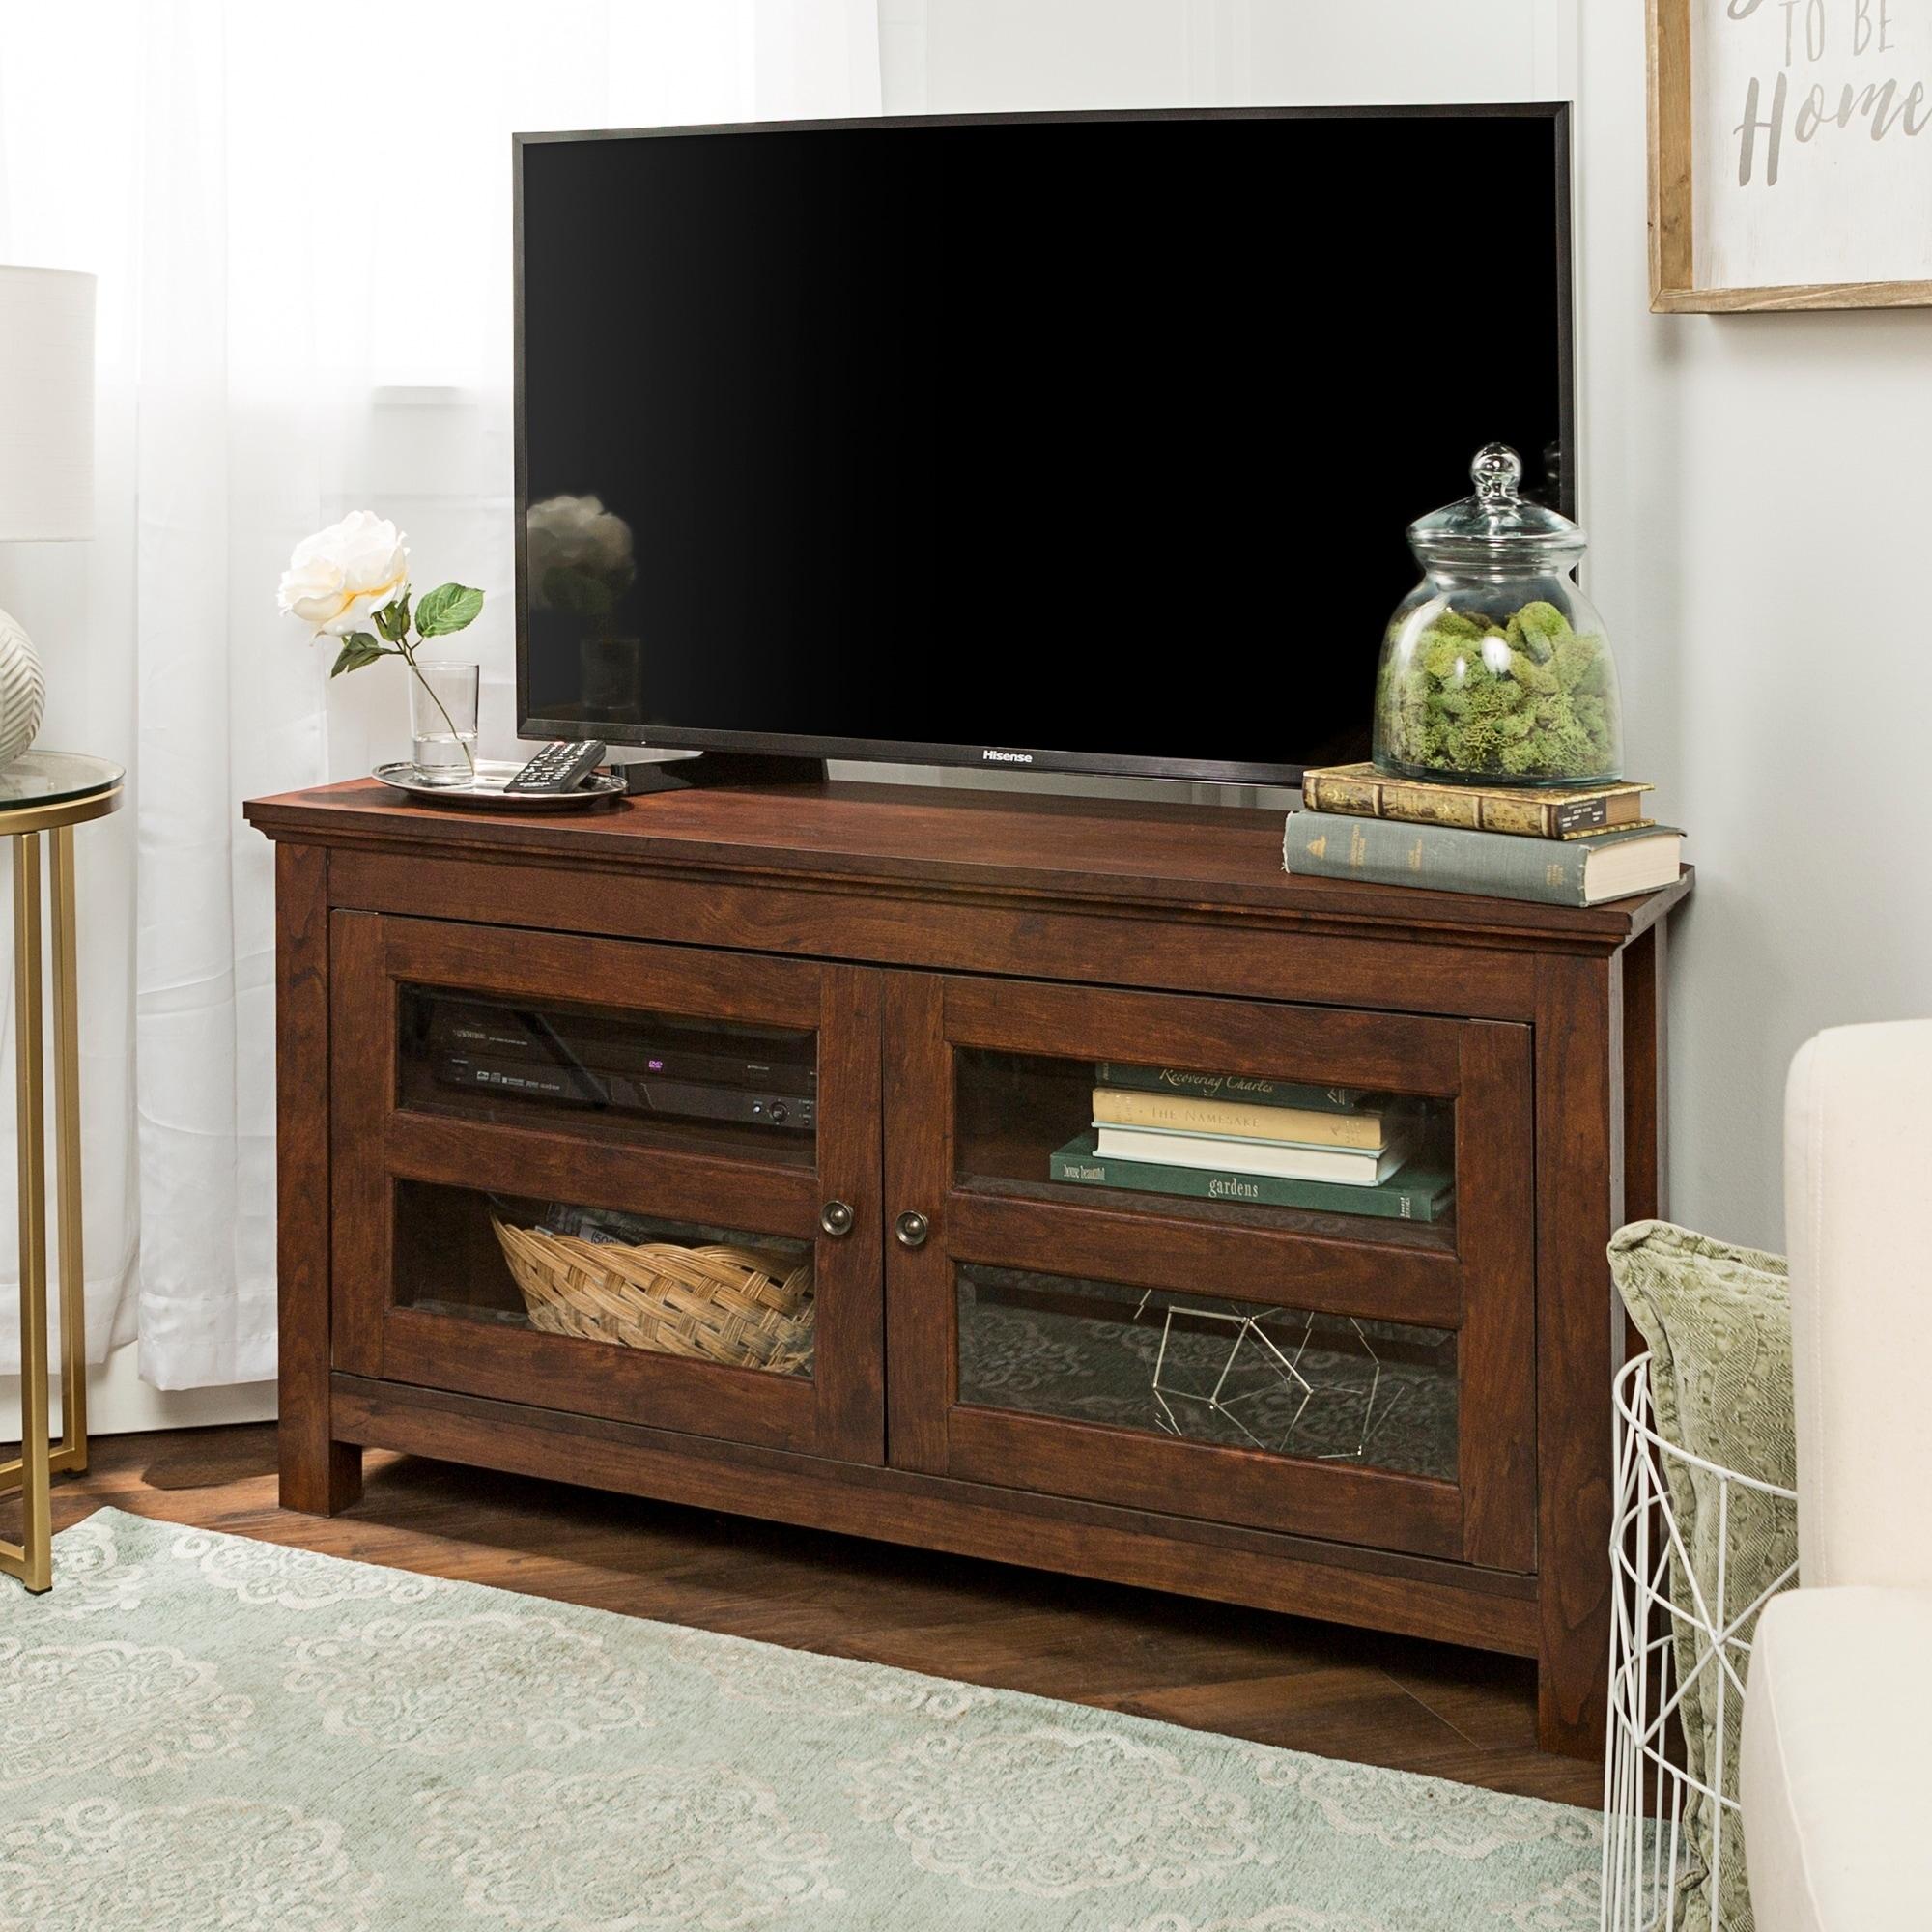 44 Inch Brown Wood Corner Tv Stand